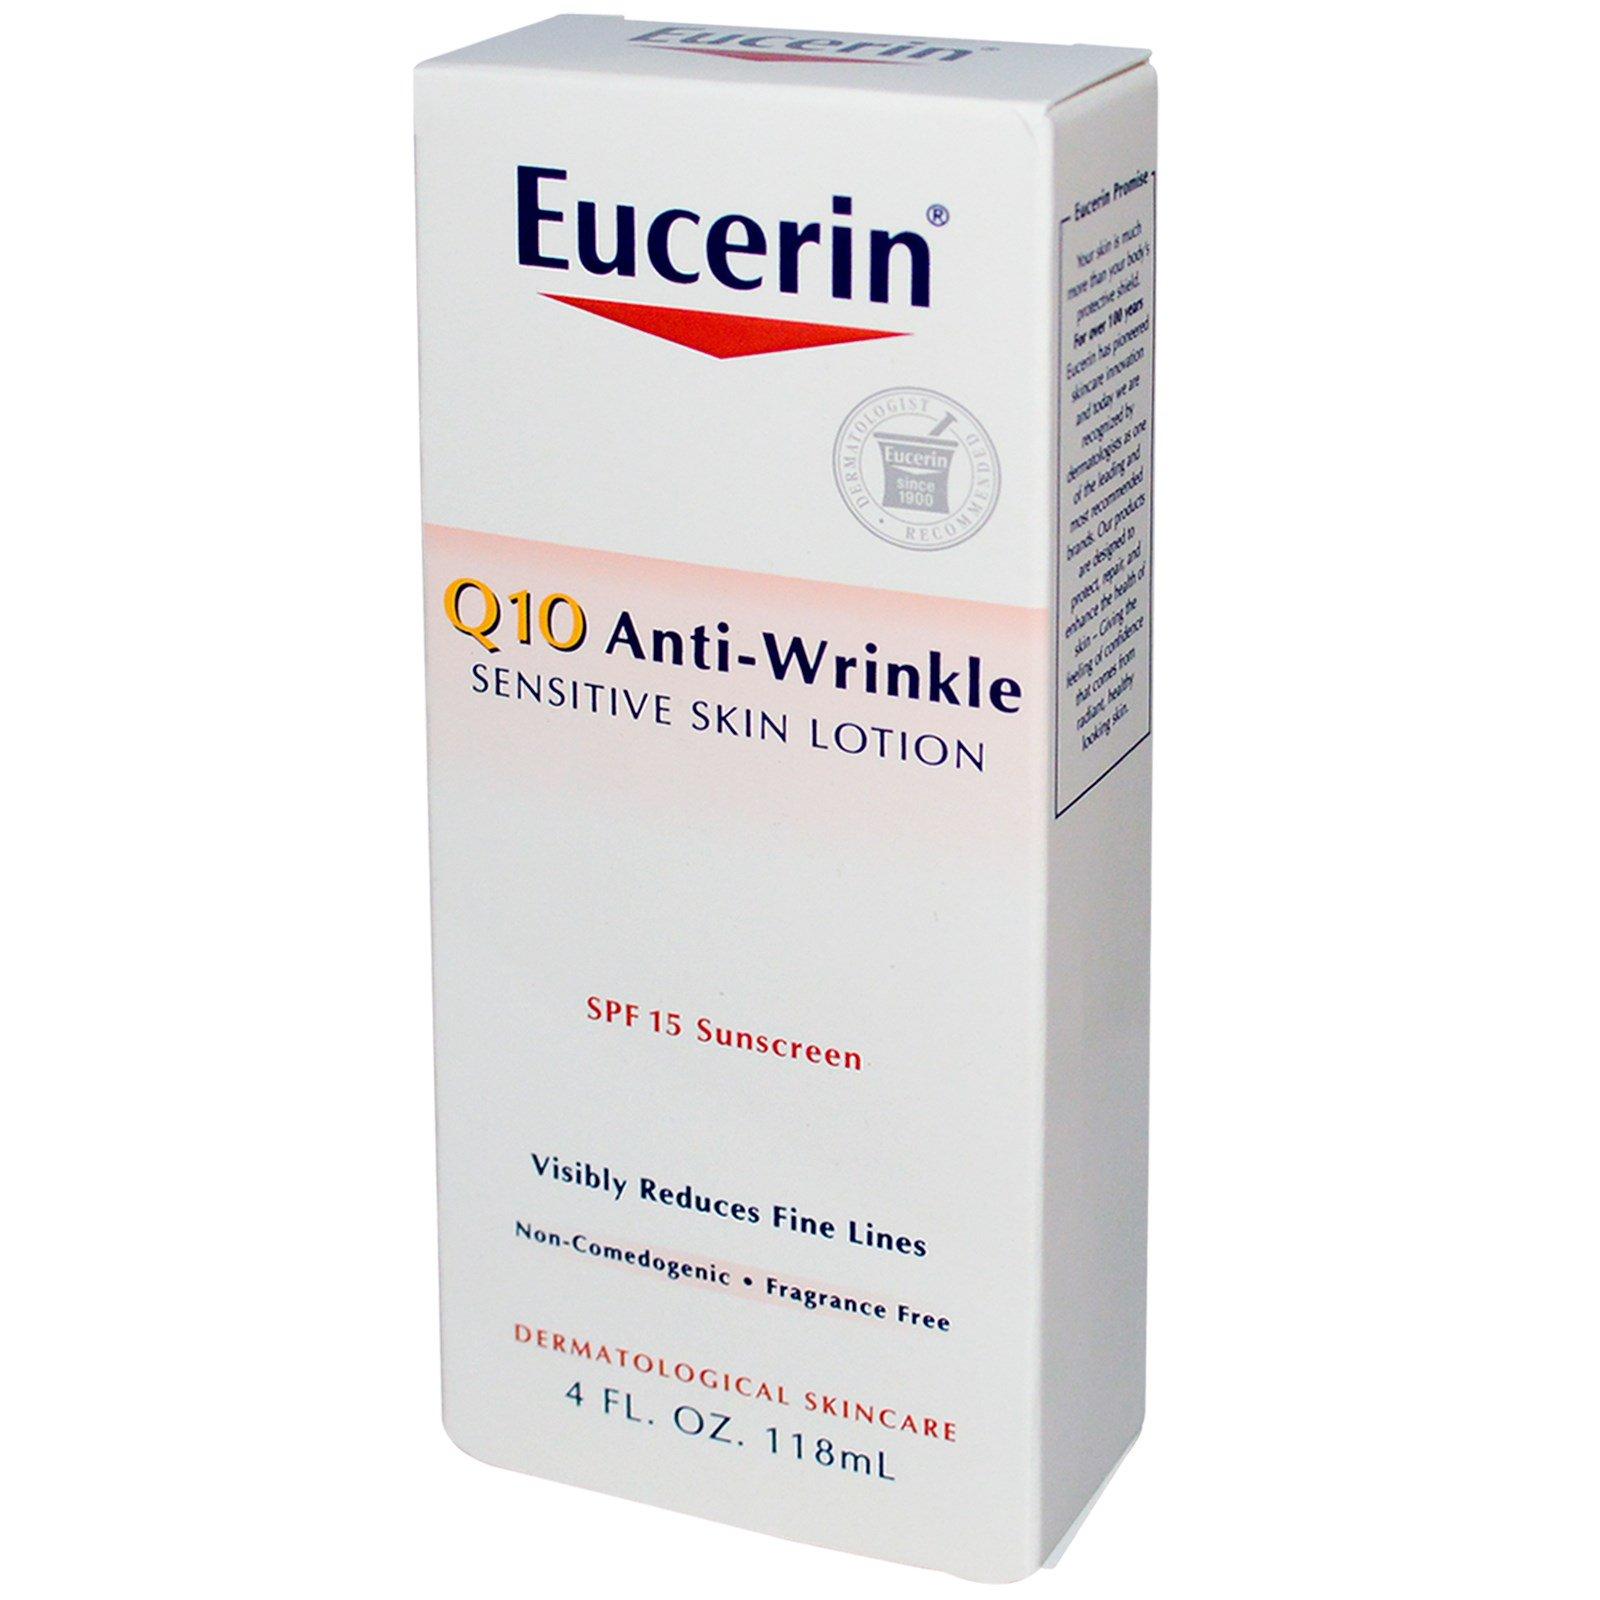 Eucerin Q10 Anti-Wrinkle Sensitive Skin Lotion SPF 15 4 oz (118 ml) package of 2 Its Skin Babyface Aqua Gel Tint 03 10 ml